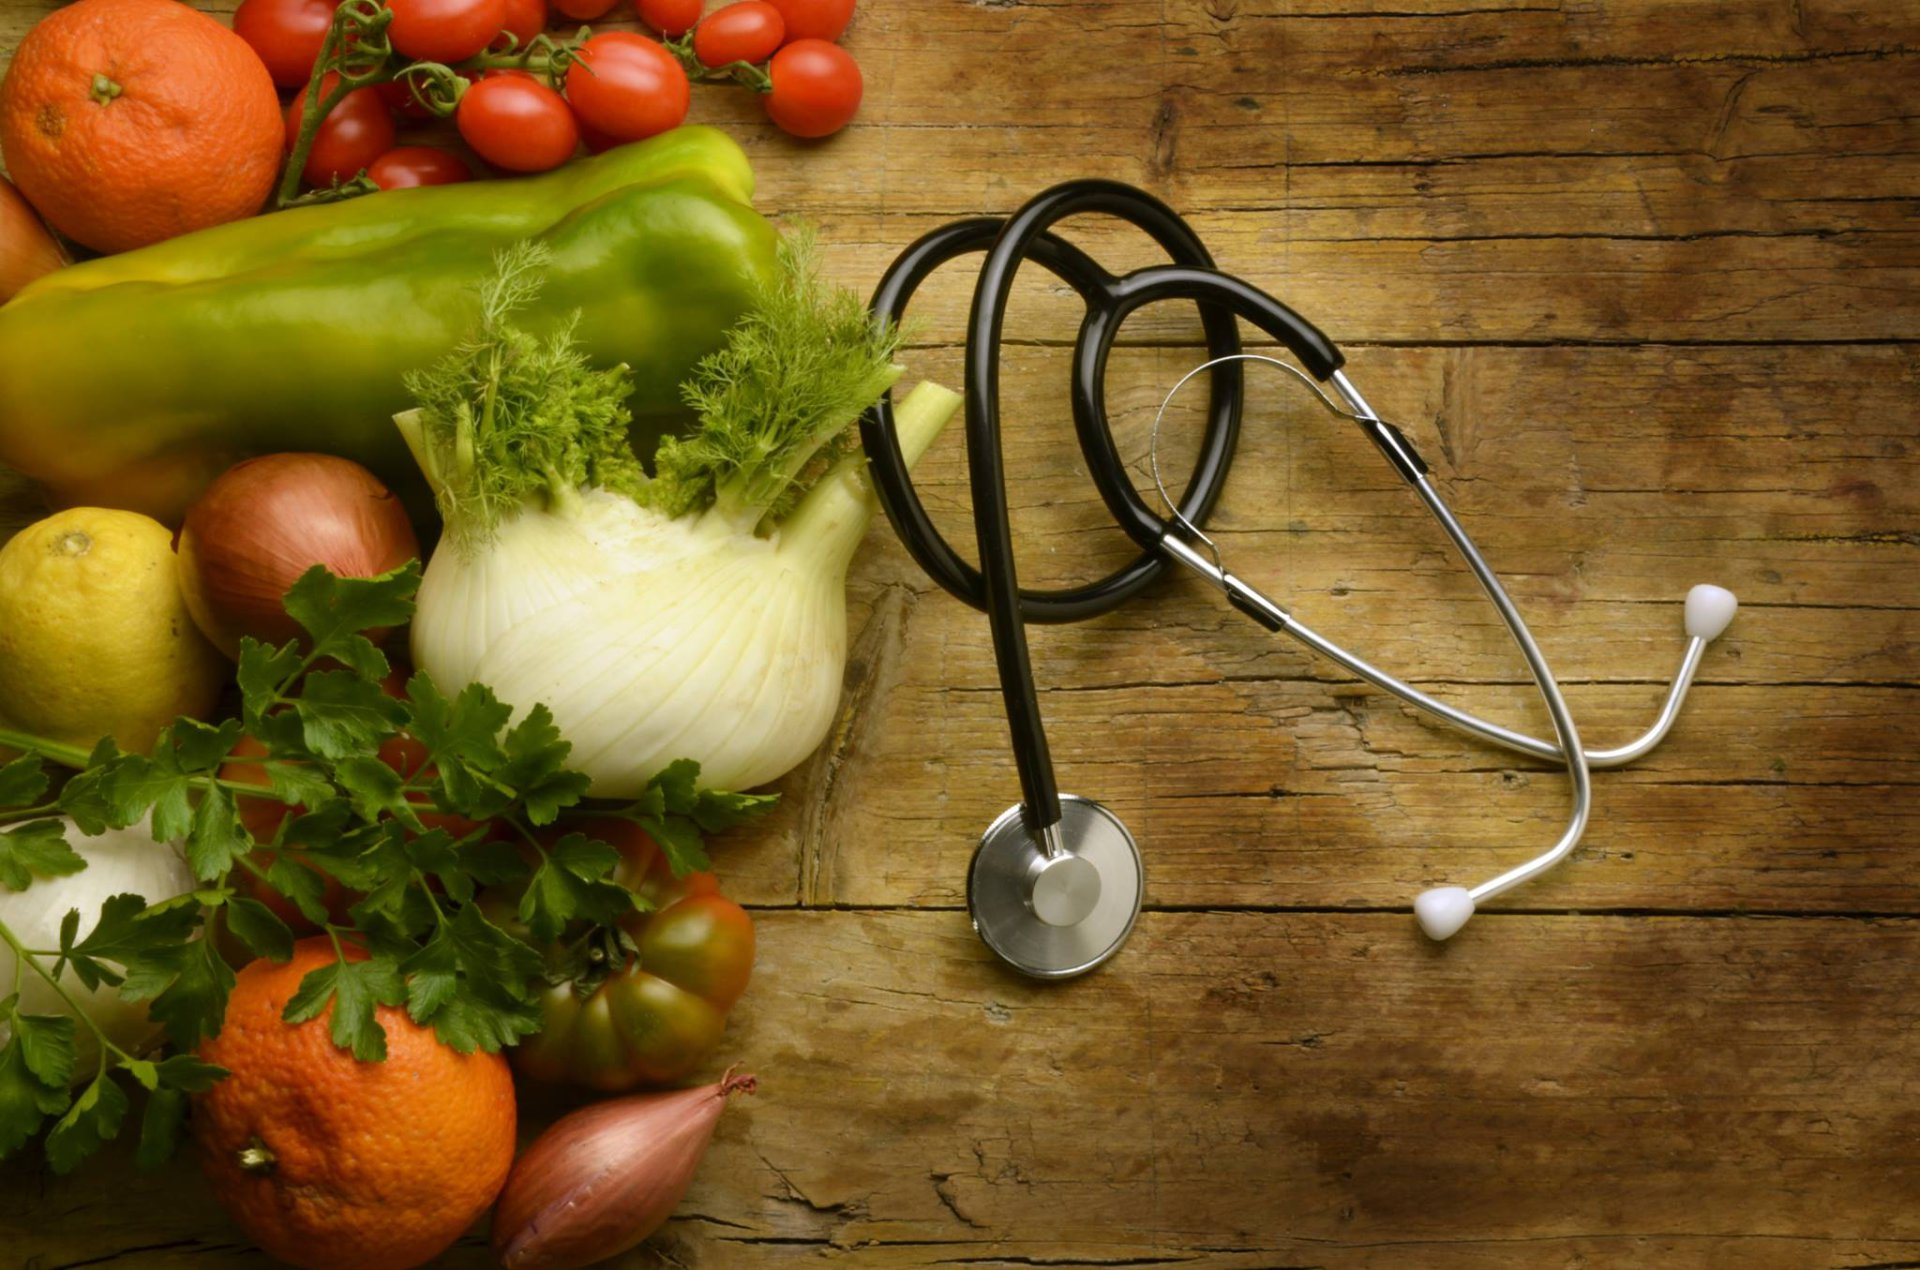 spaudimas sergant hipertenzija